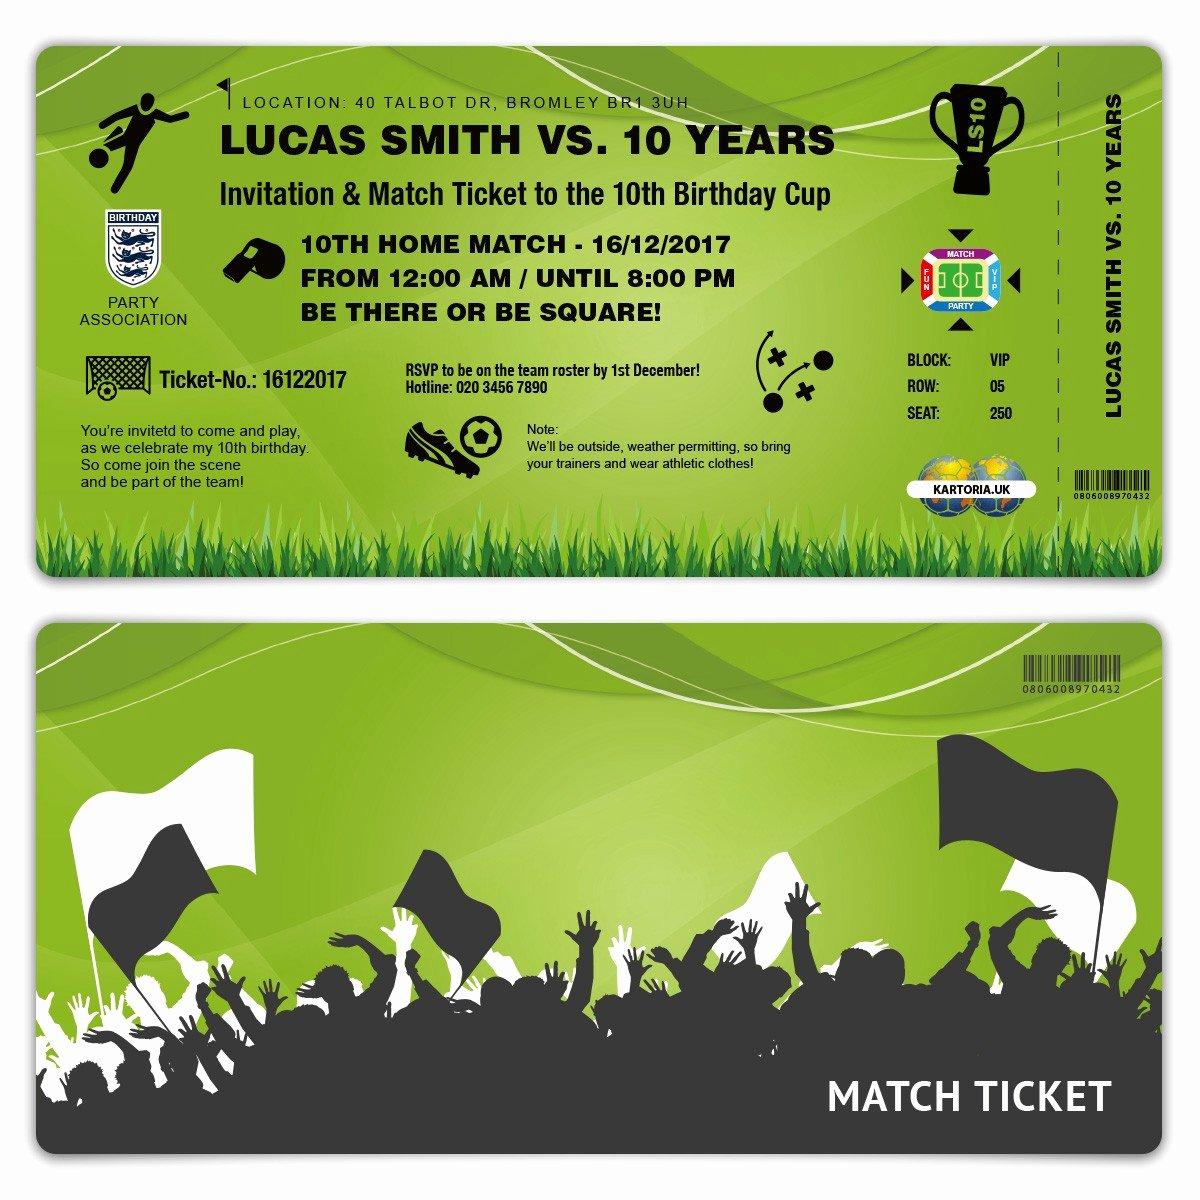 Football Ticket Birthday Invitations Elegant Kids Birthday Invitation Green Football Match Ticket